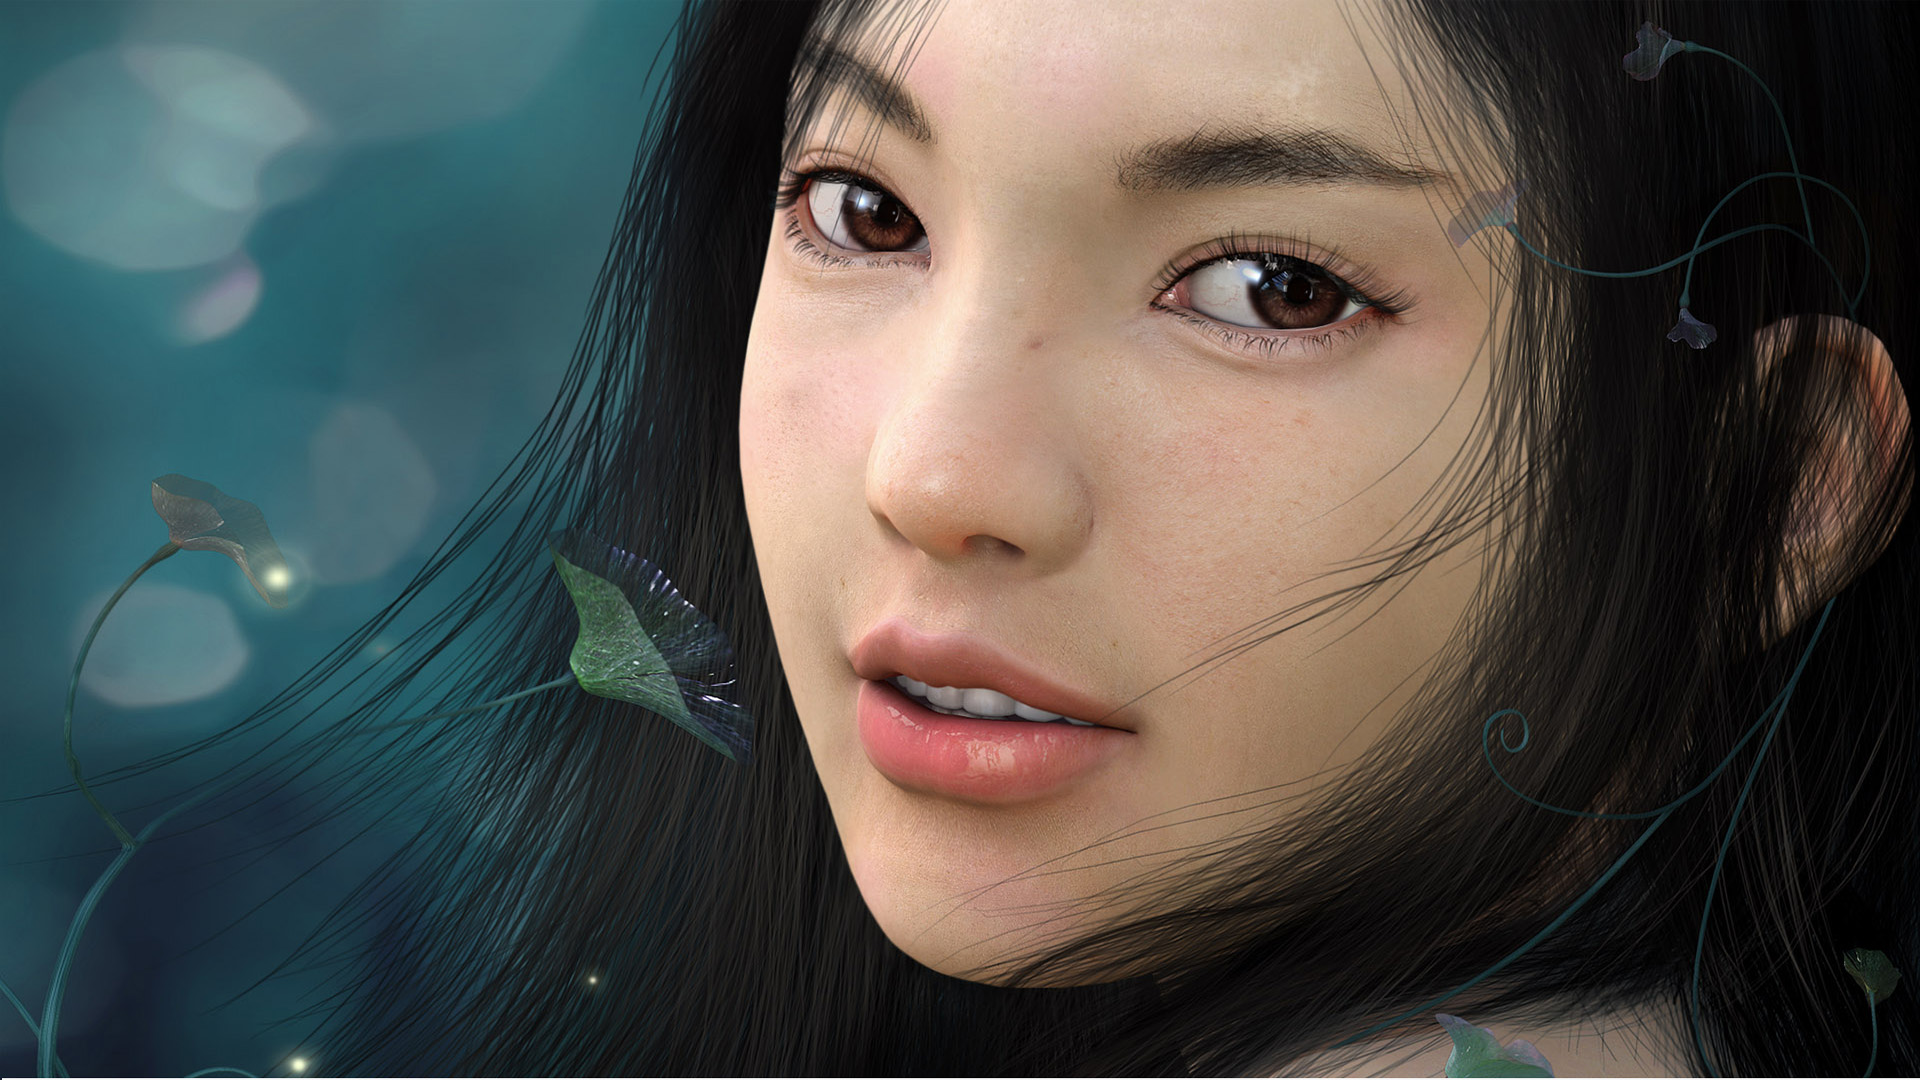 animeinterface ten (10) unbelievable realistic anime girls drawings